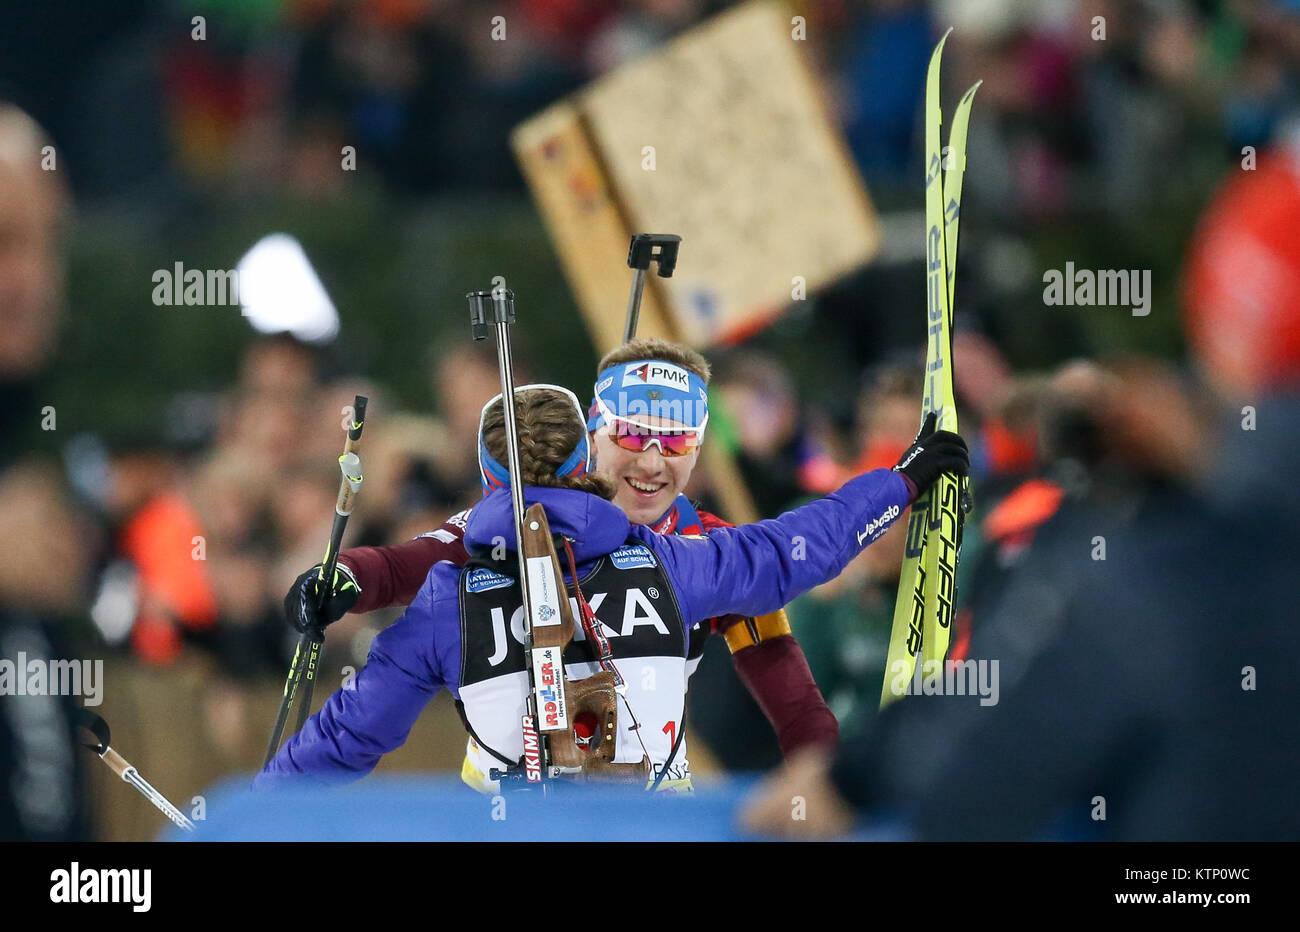 Alexey Volkov - Russian biathlete 90